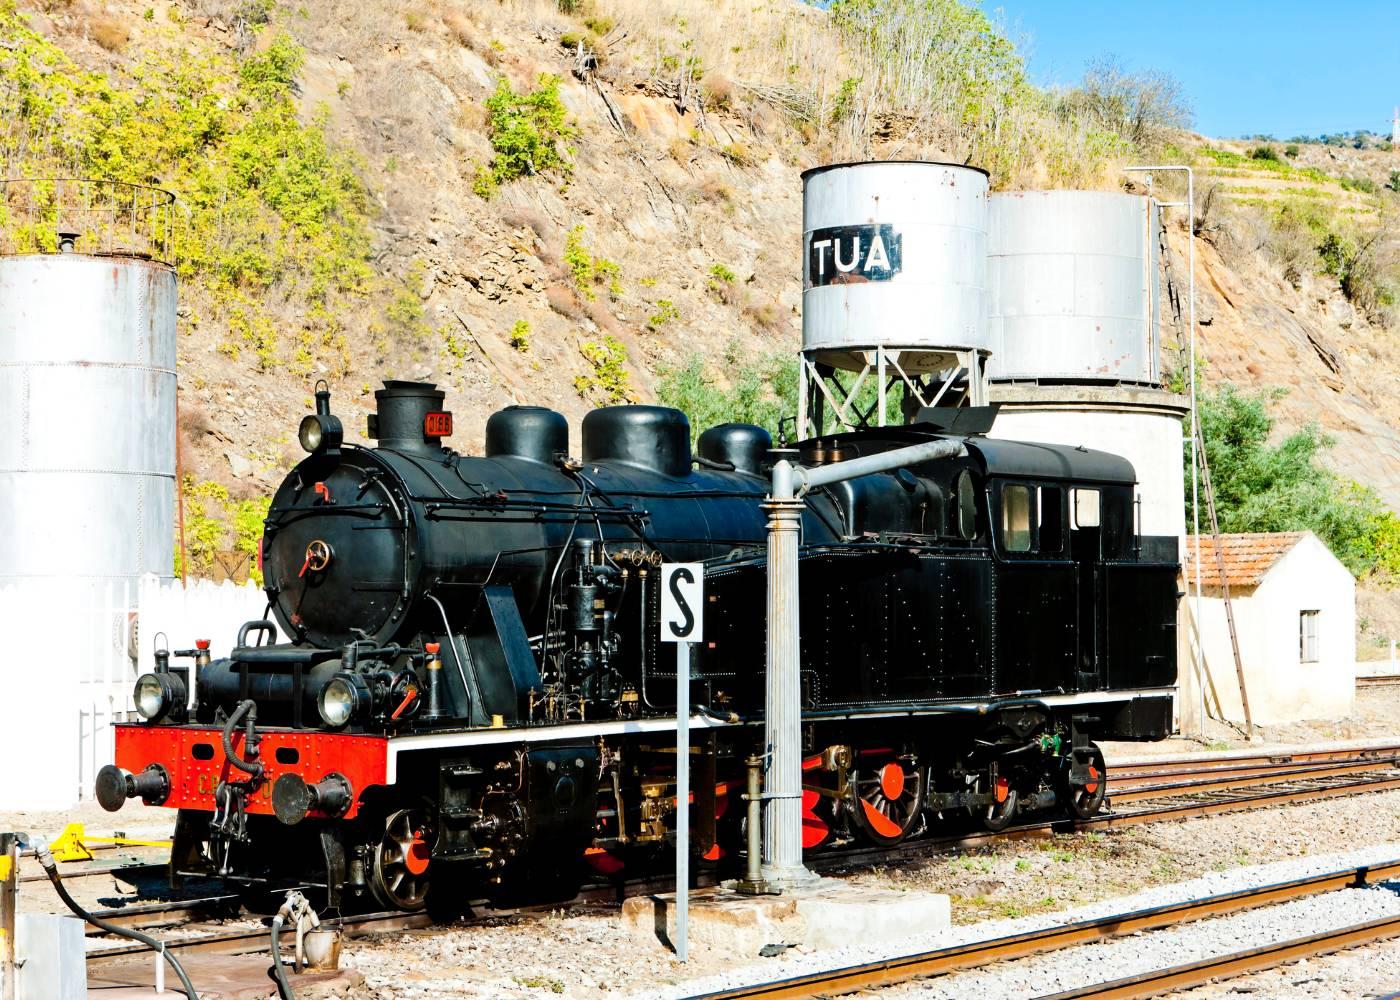 locomotiva no Tua